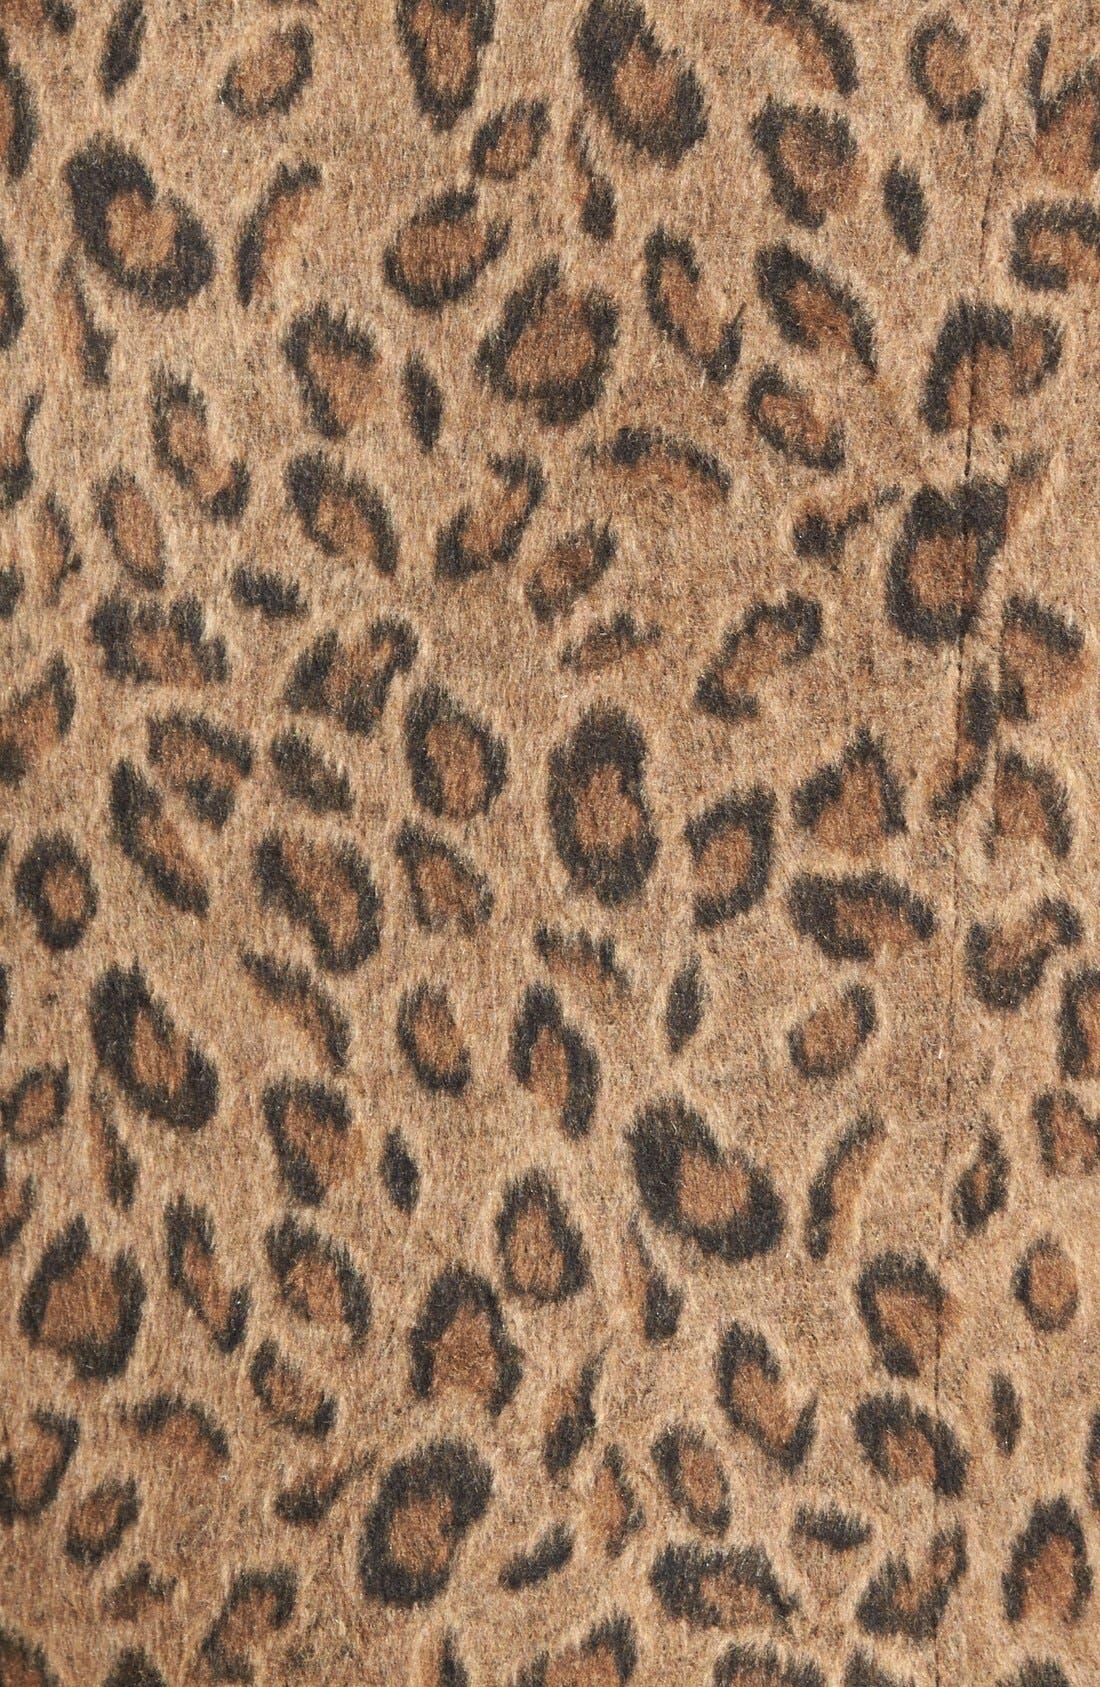 Leopard Print Moto Jacket,                             Alternate thumbnail 2, color,                             235